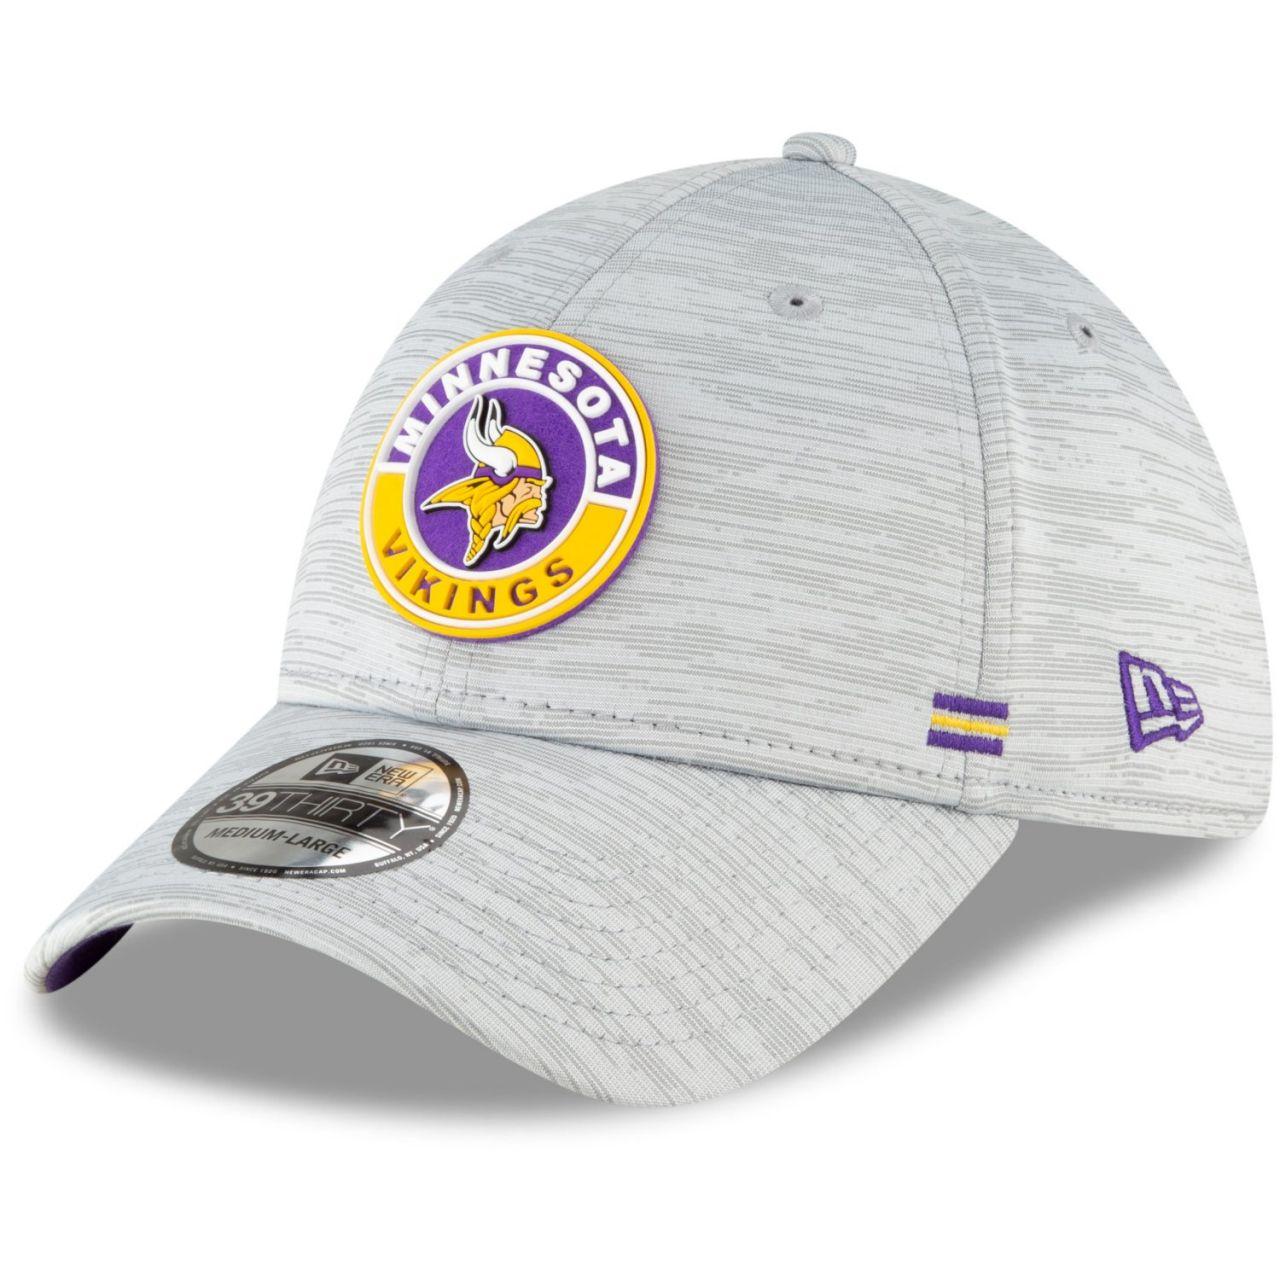 amfoo - New Era 39Thirty Cap - SIDELINE 2020 Minnesota Vikings